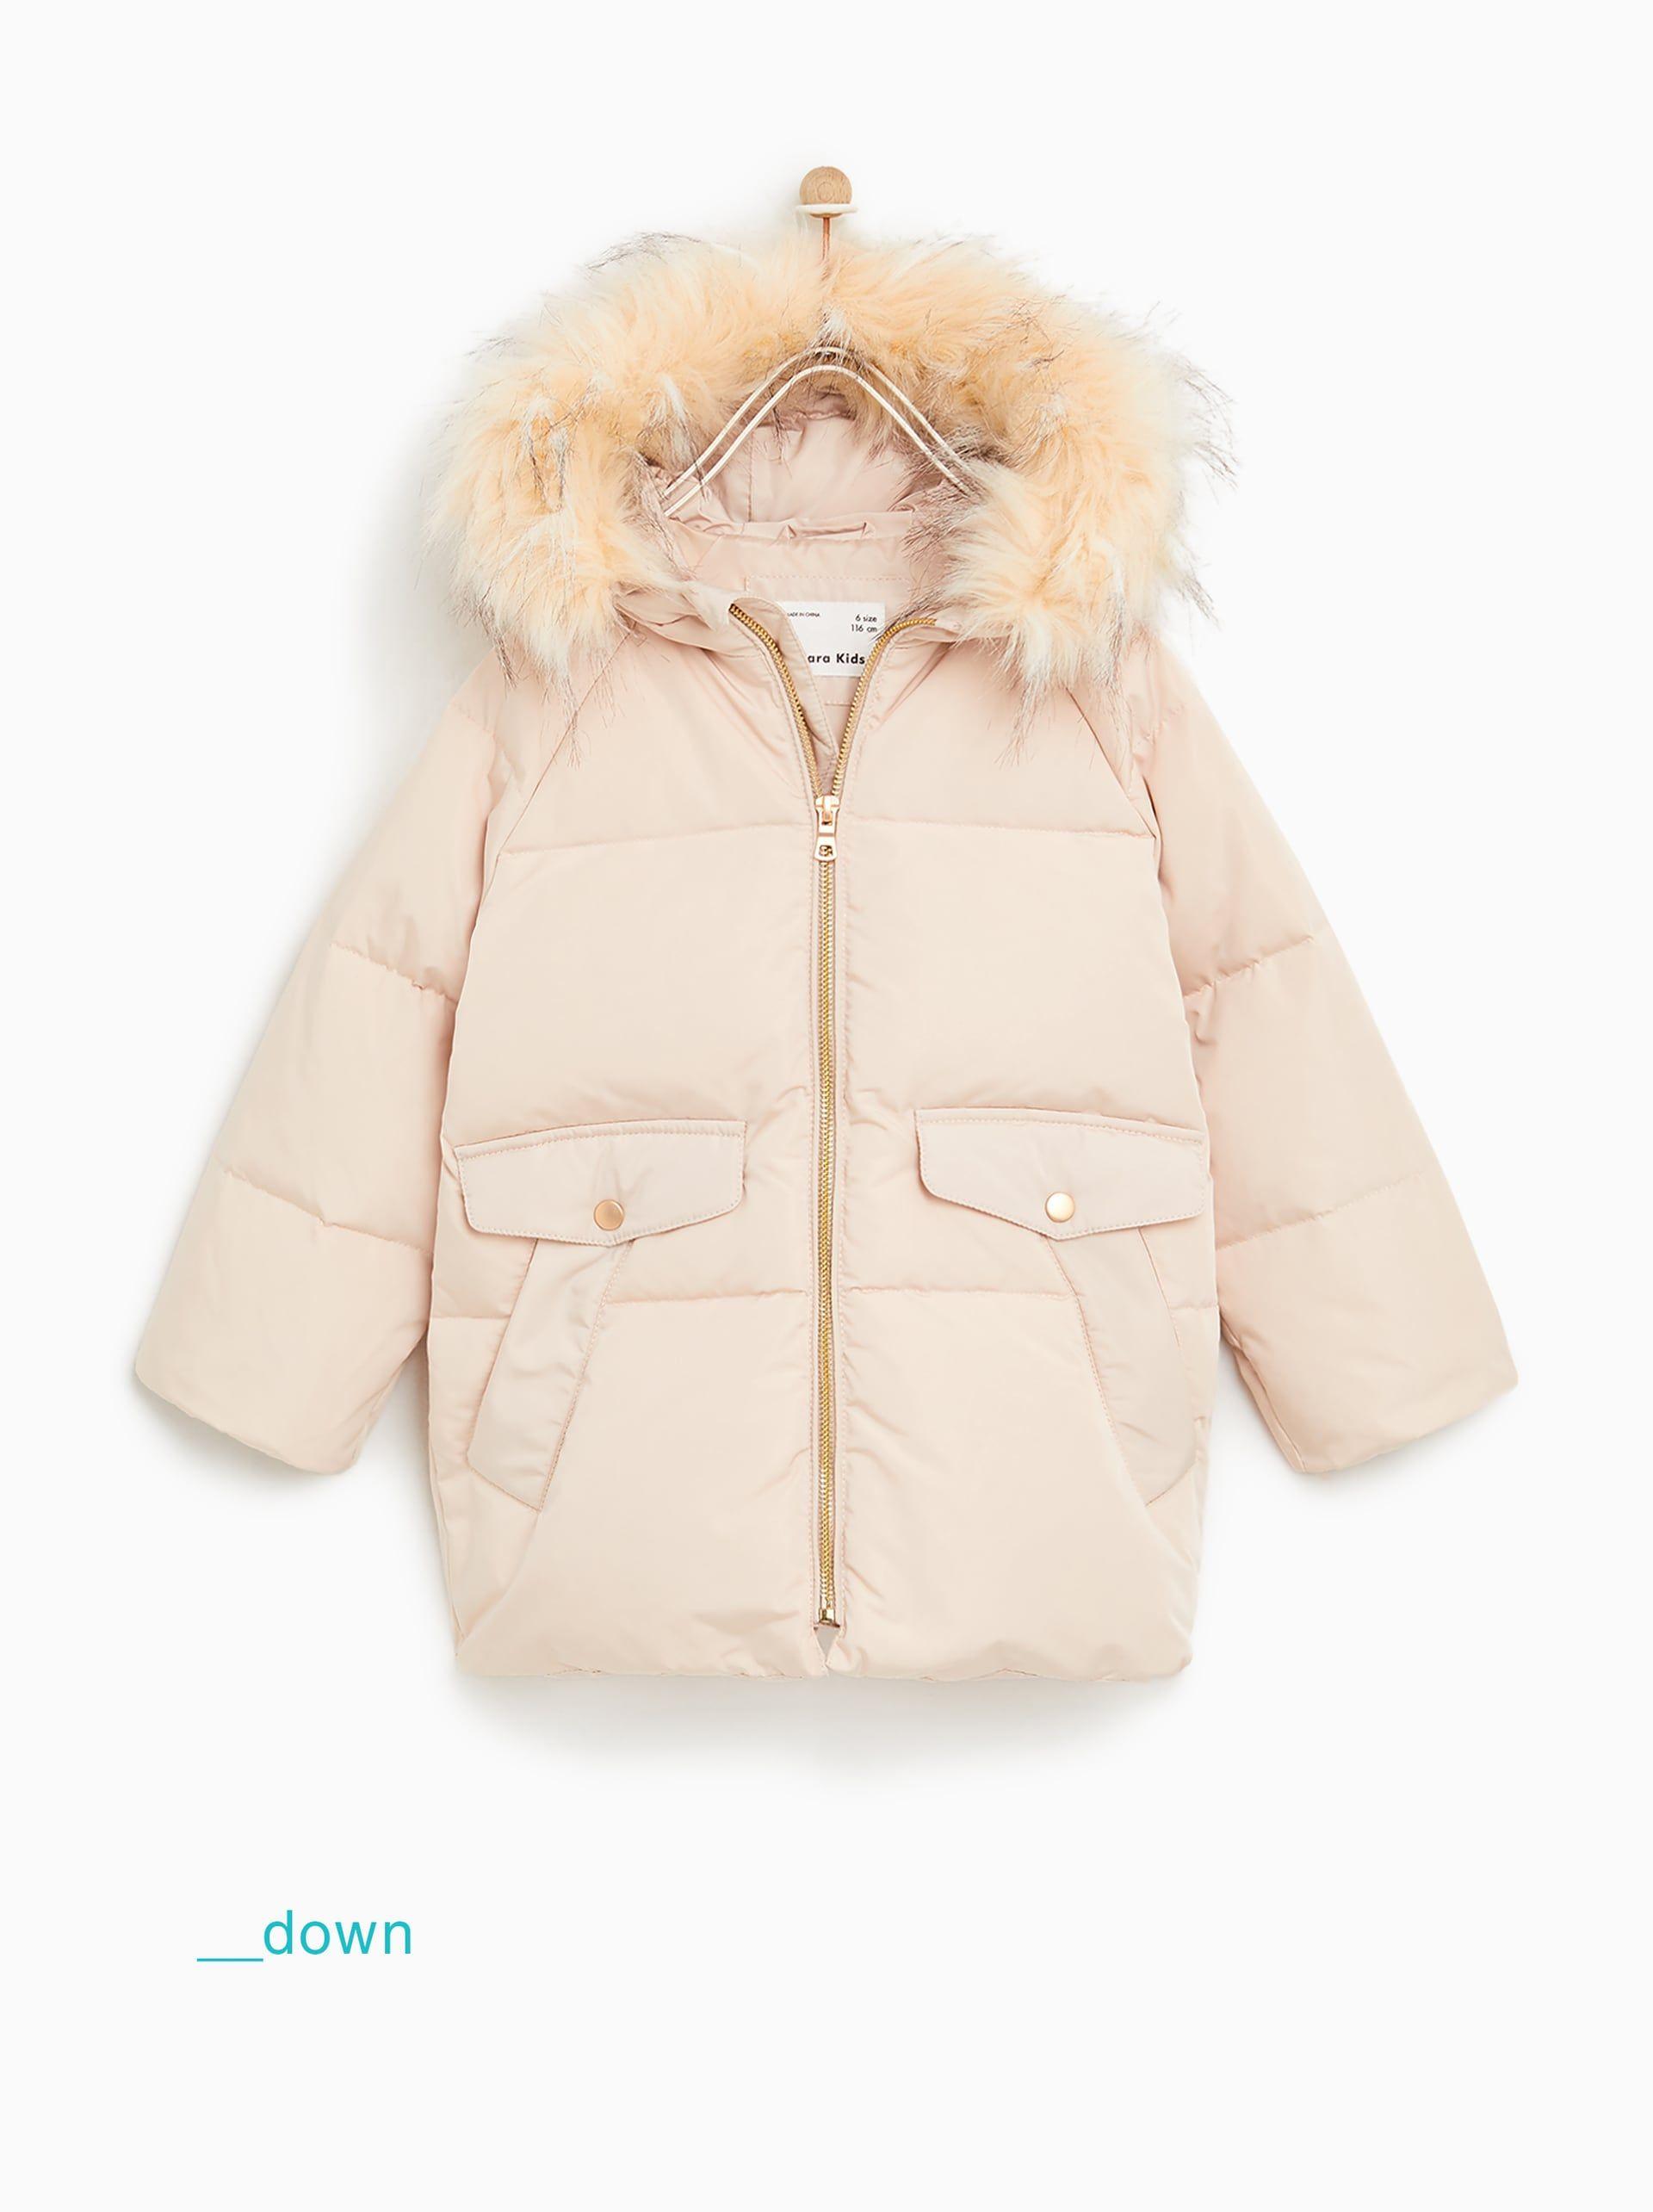 efa5c4cb6 Down puffer jacket with detachable faux fur